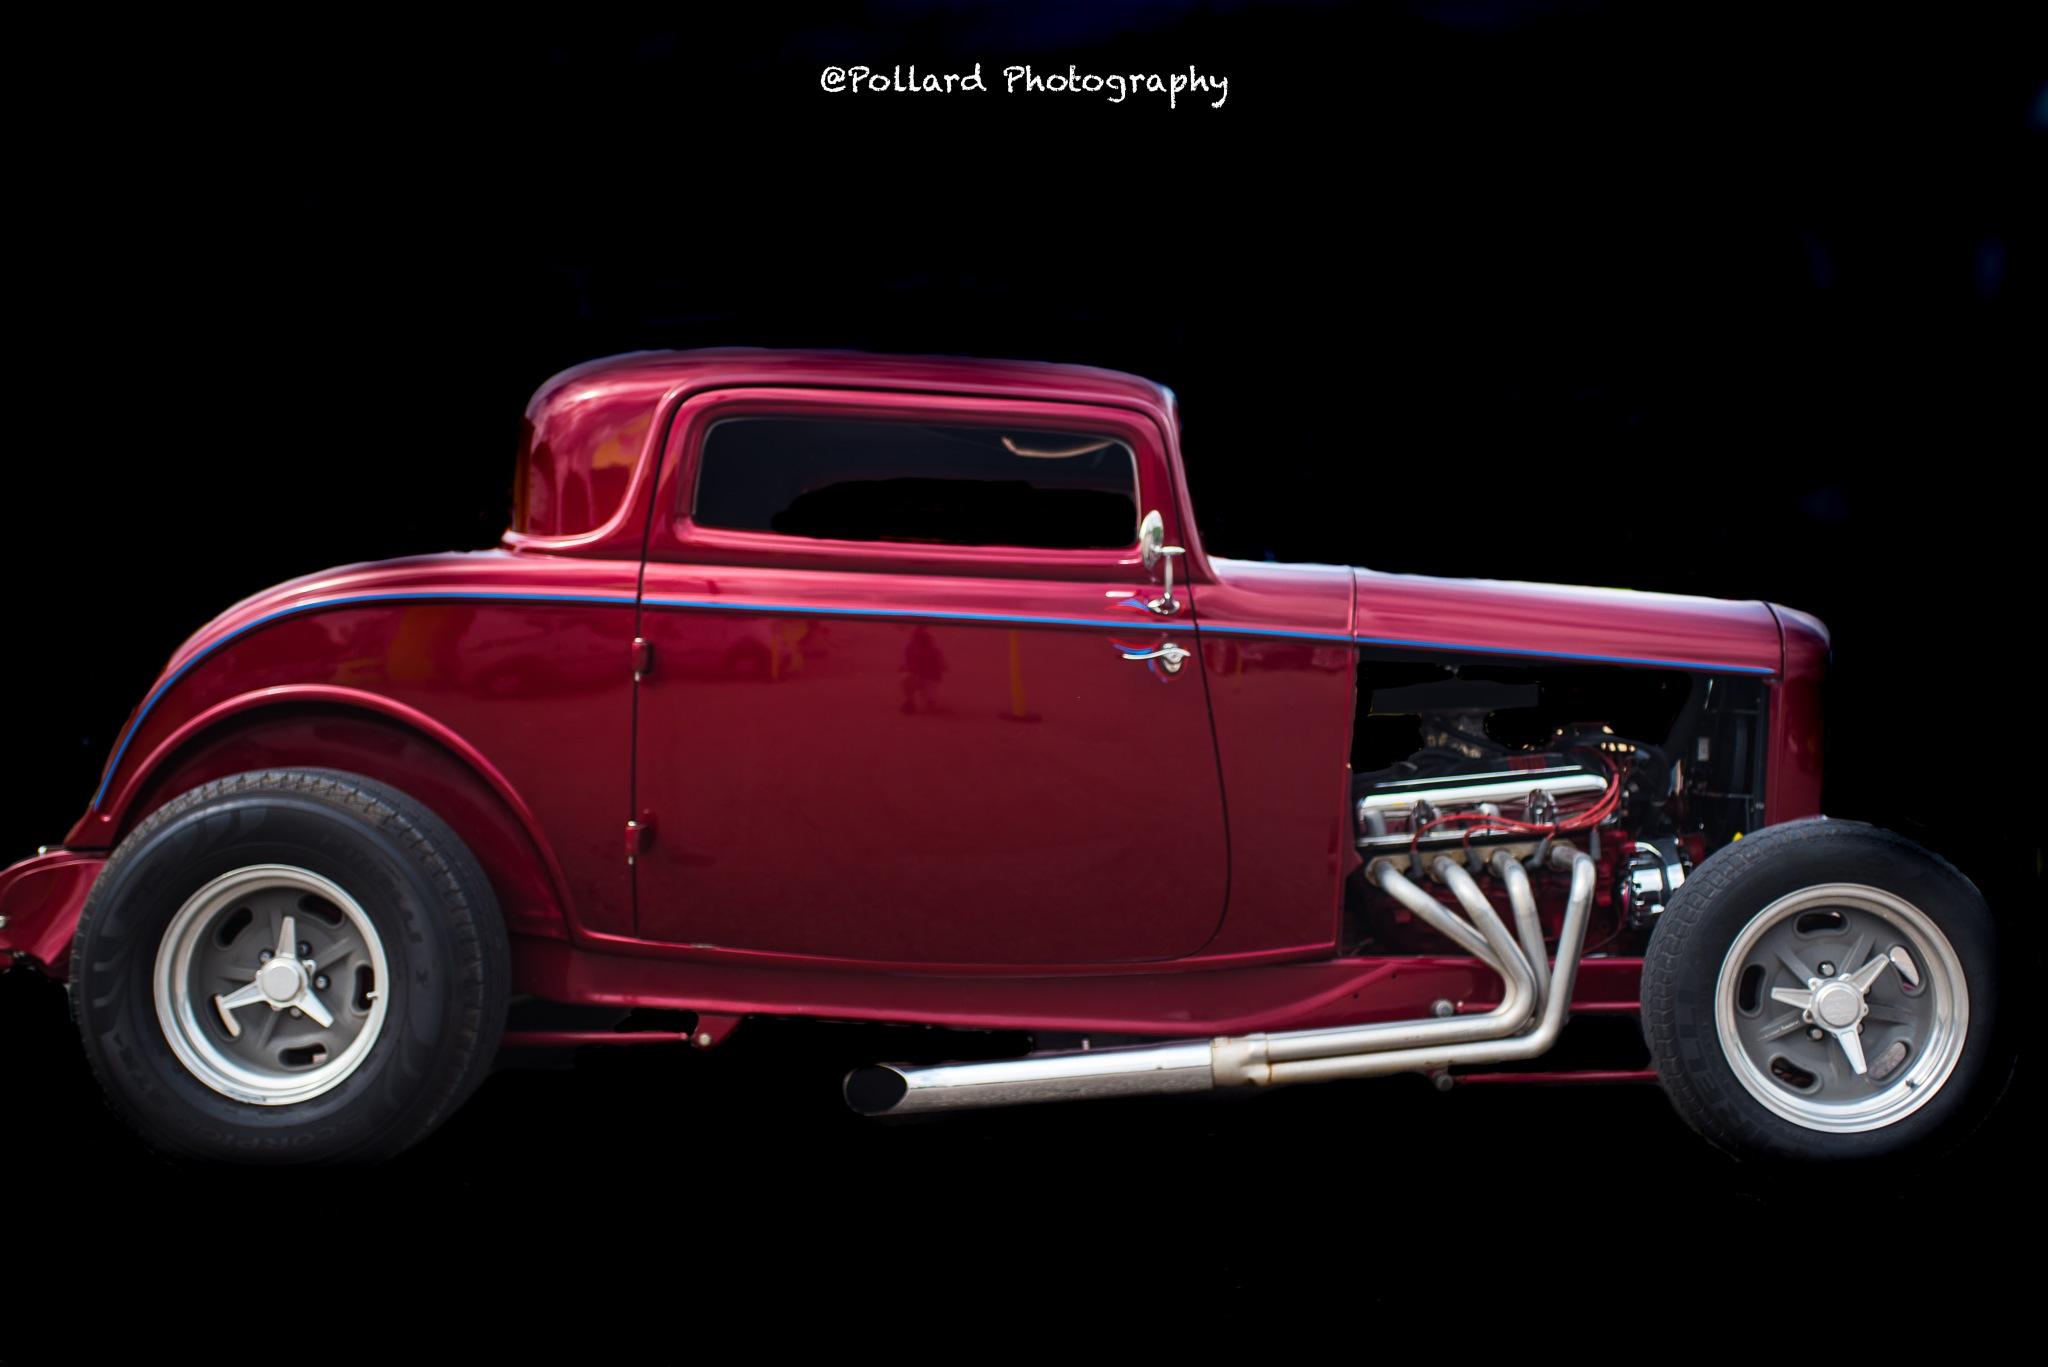 Hot Rod by Thomas Pollard